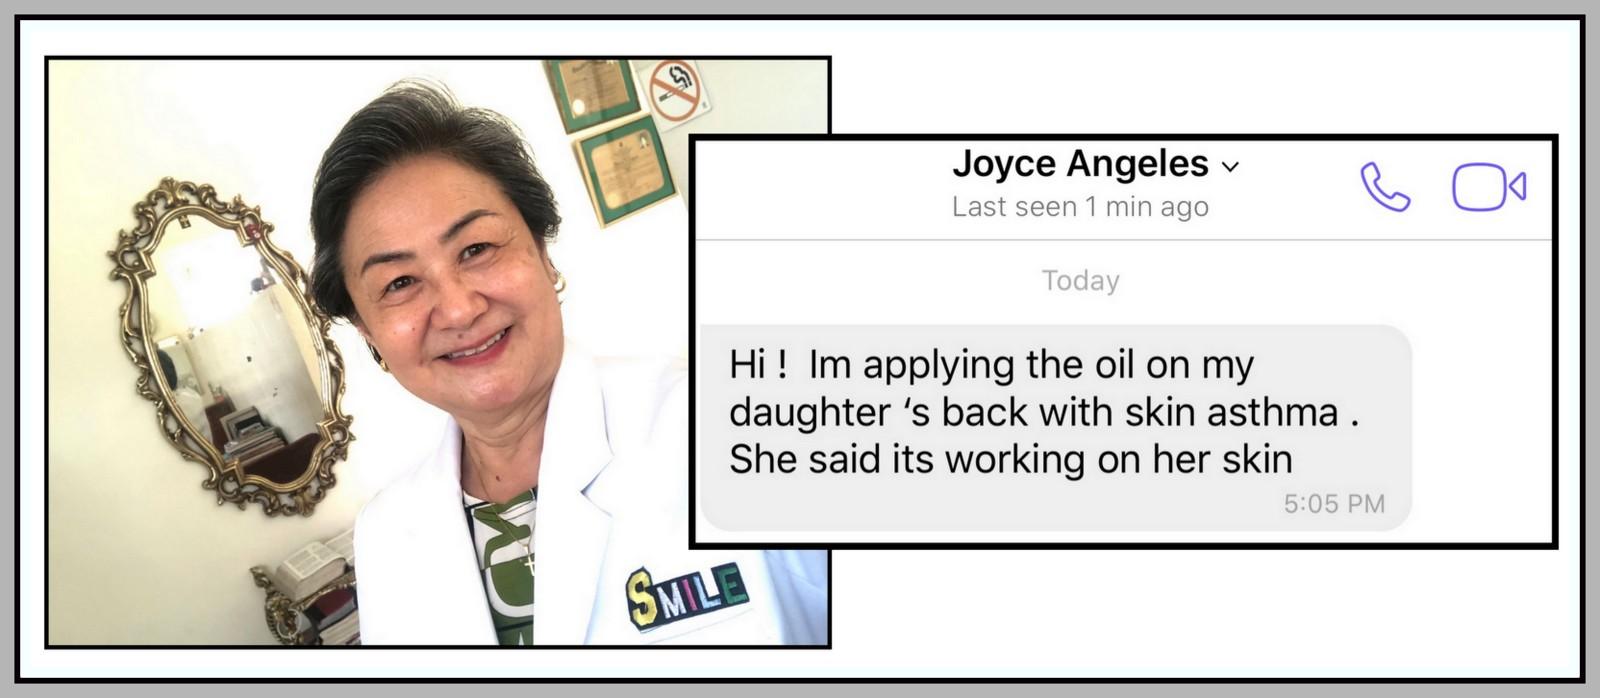 Dr. Joyce Angeles